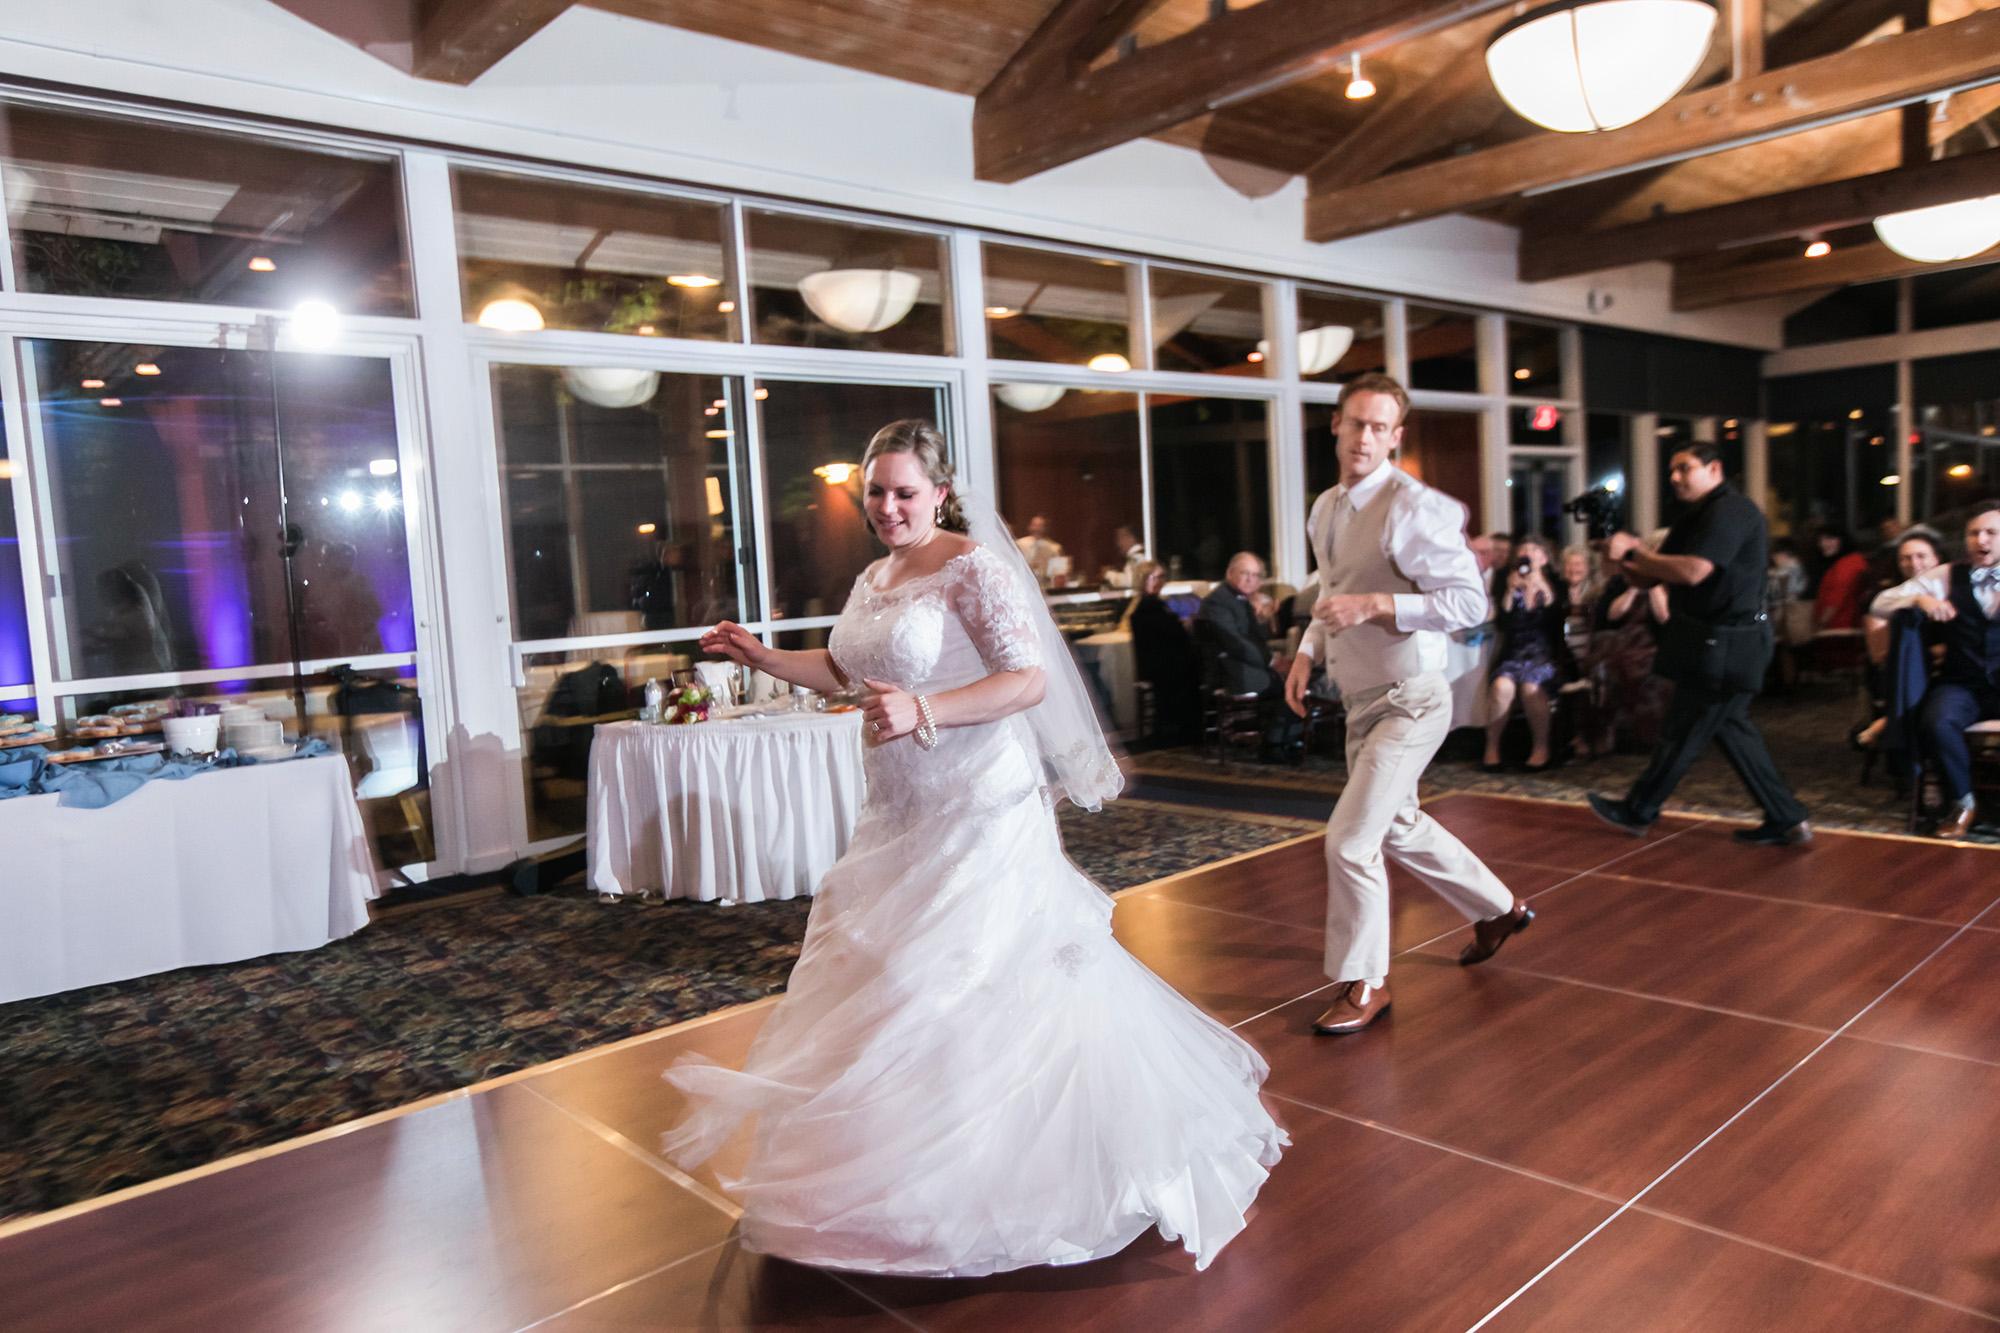 unforgettable-st-monica-wedding-carrie-vines-photography-120.jpg